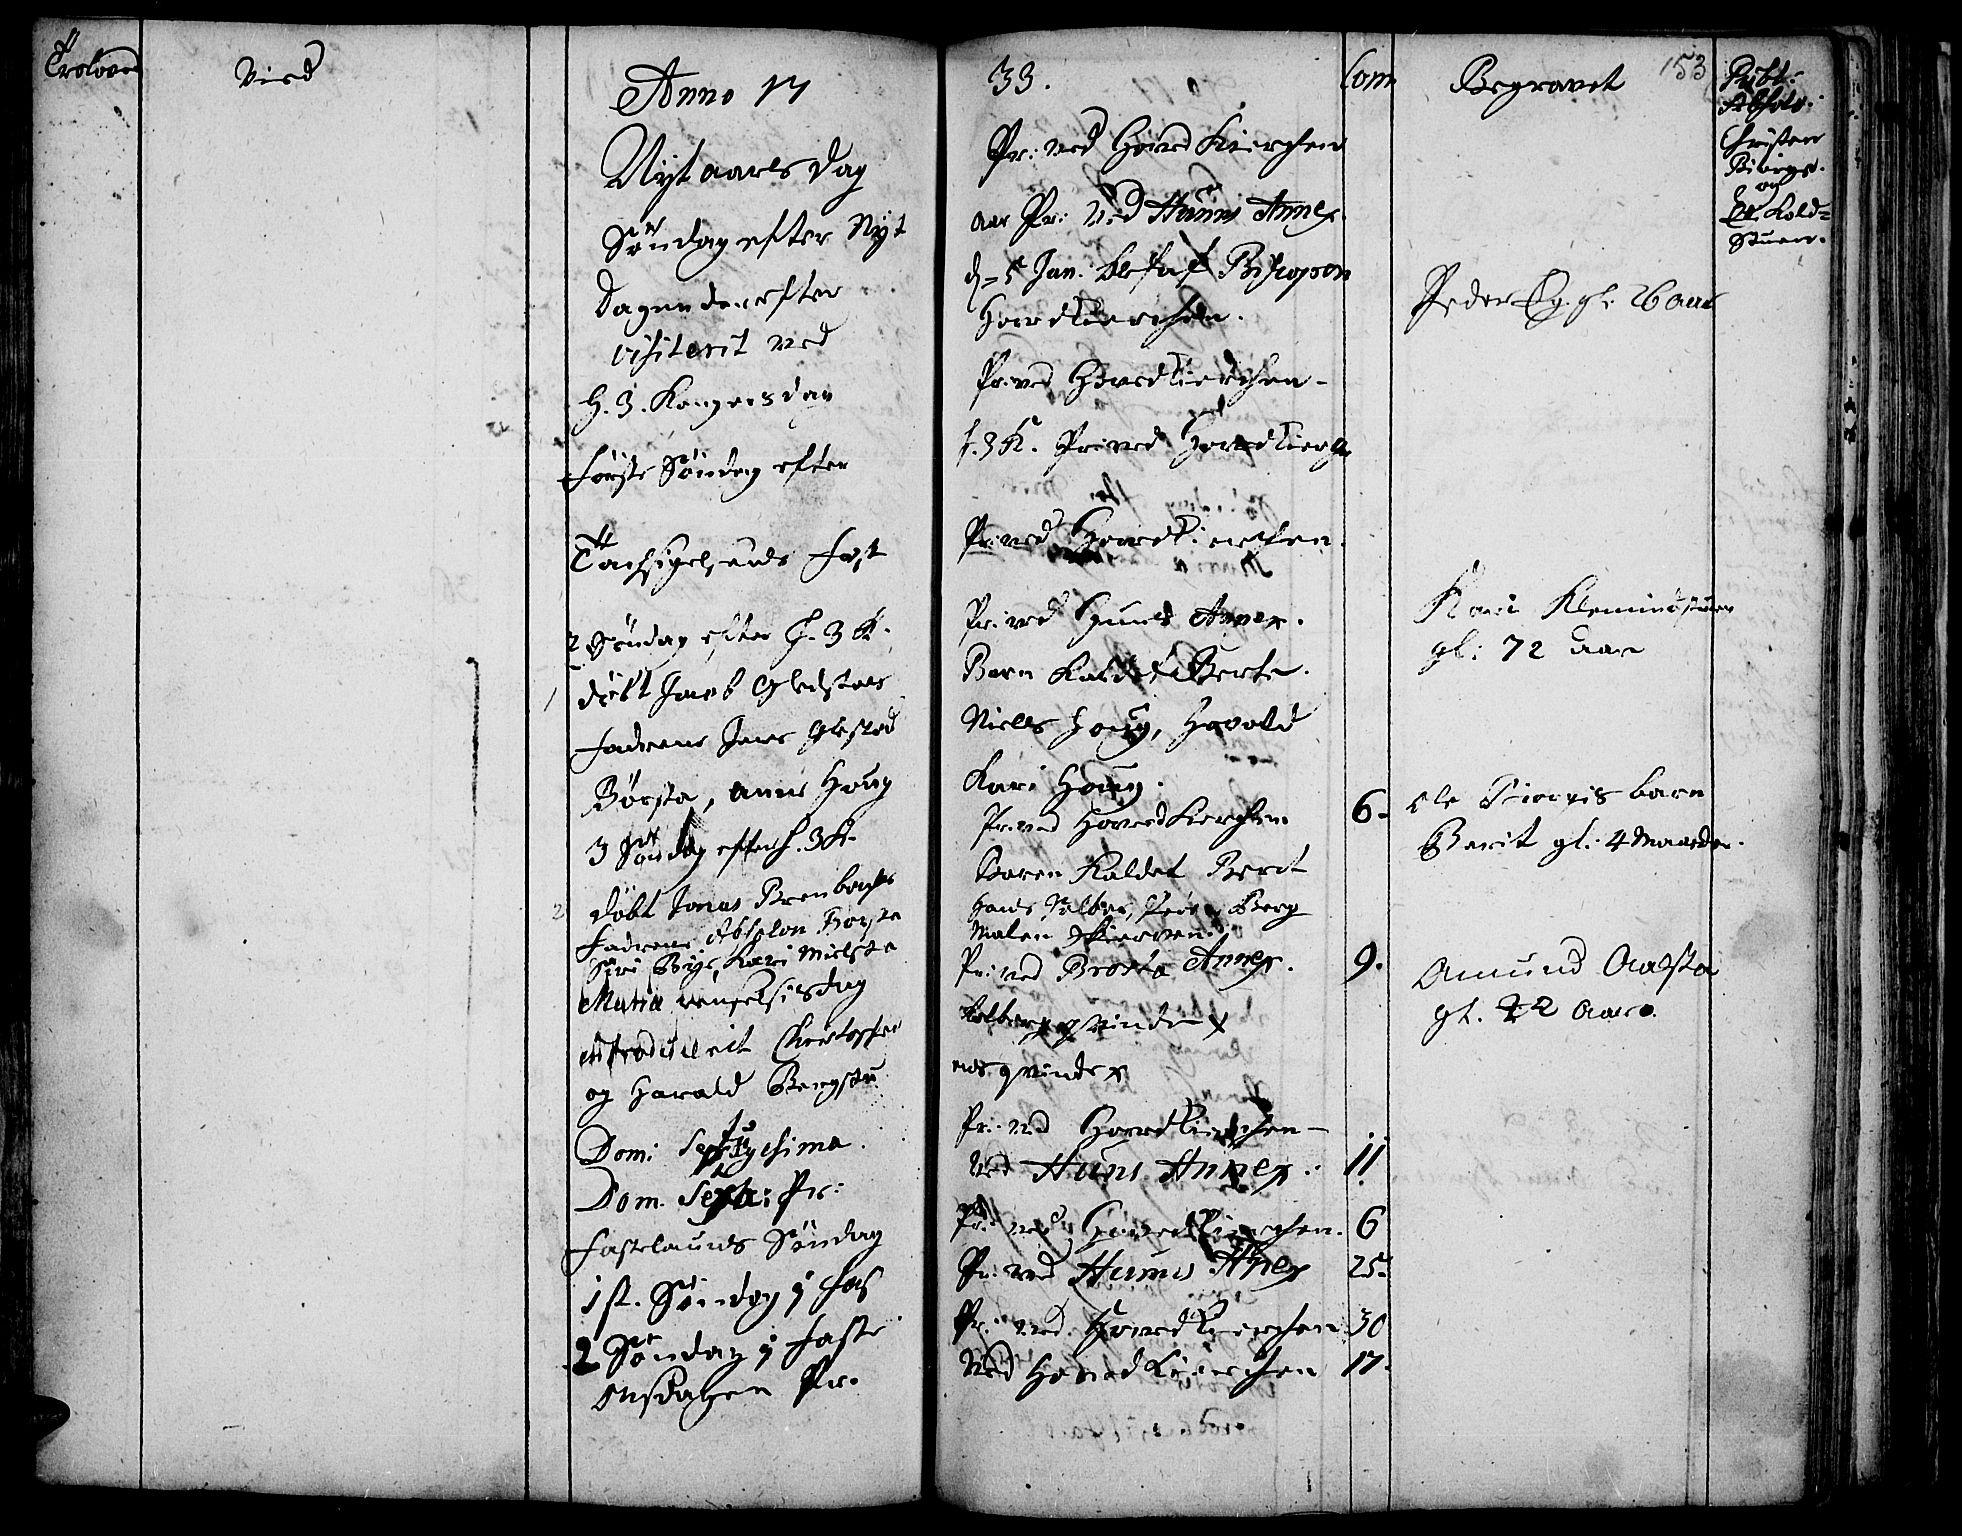 SAH, Vardal prestekontor, H/Ha/Haa/L0001: Ministerialbok nr. 1, 1706-1748, s. 153